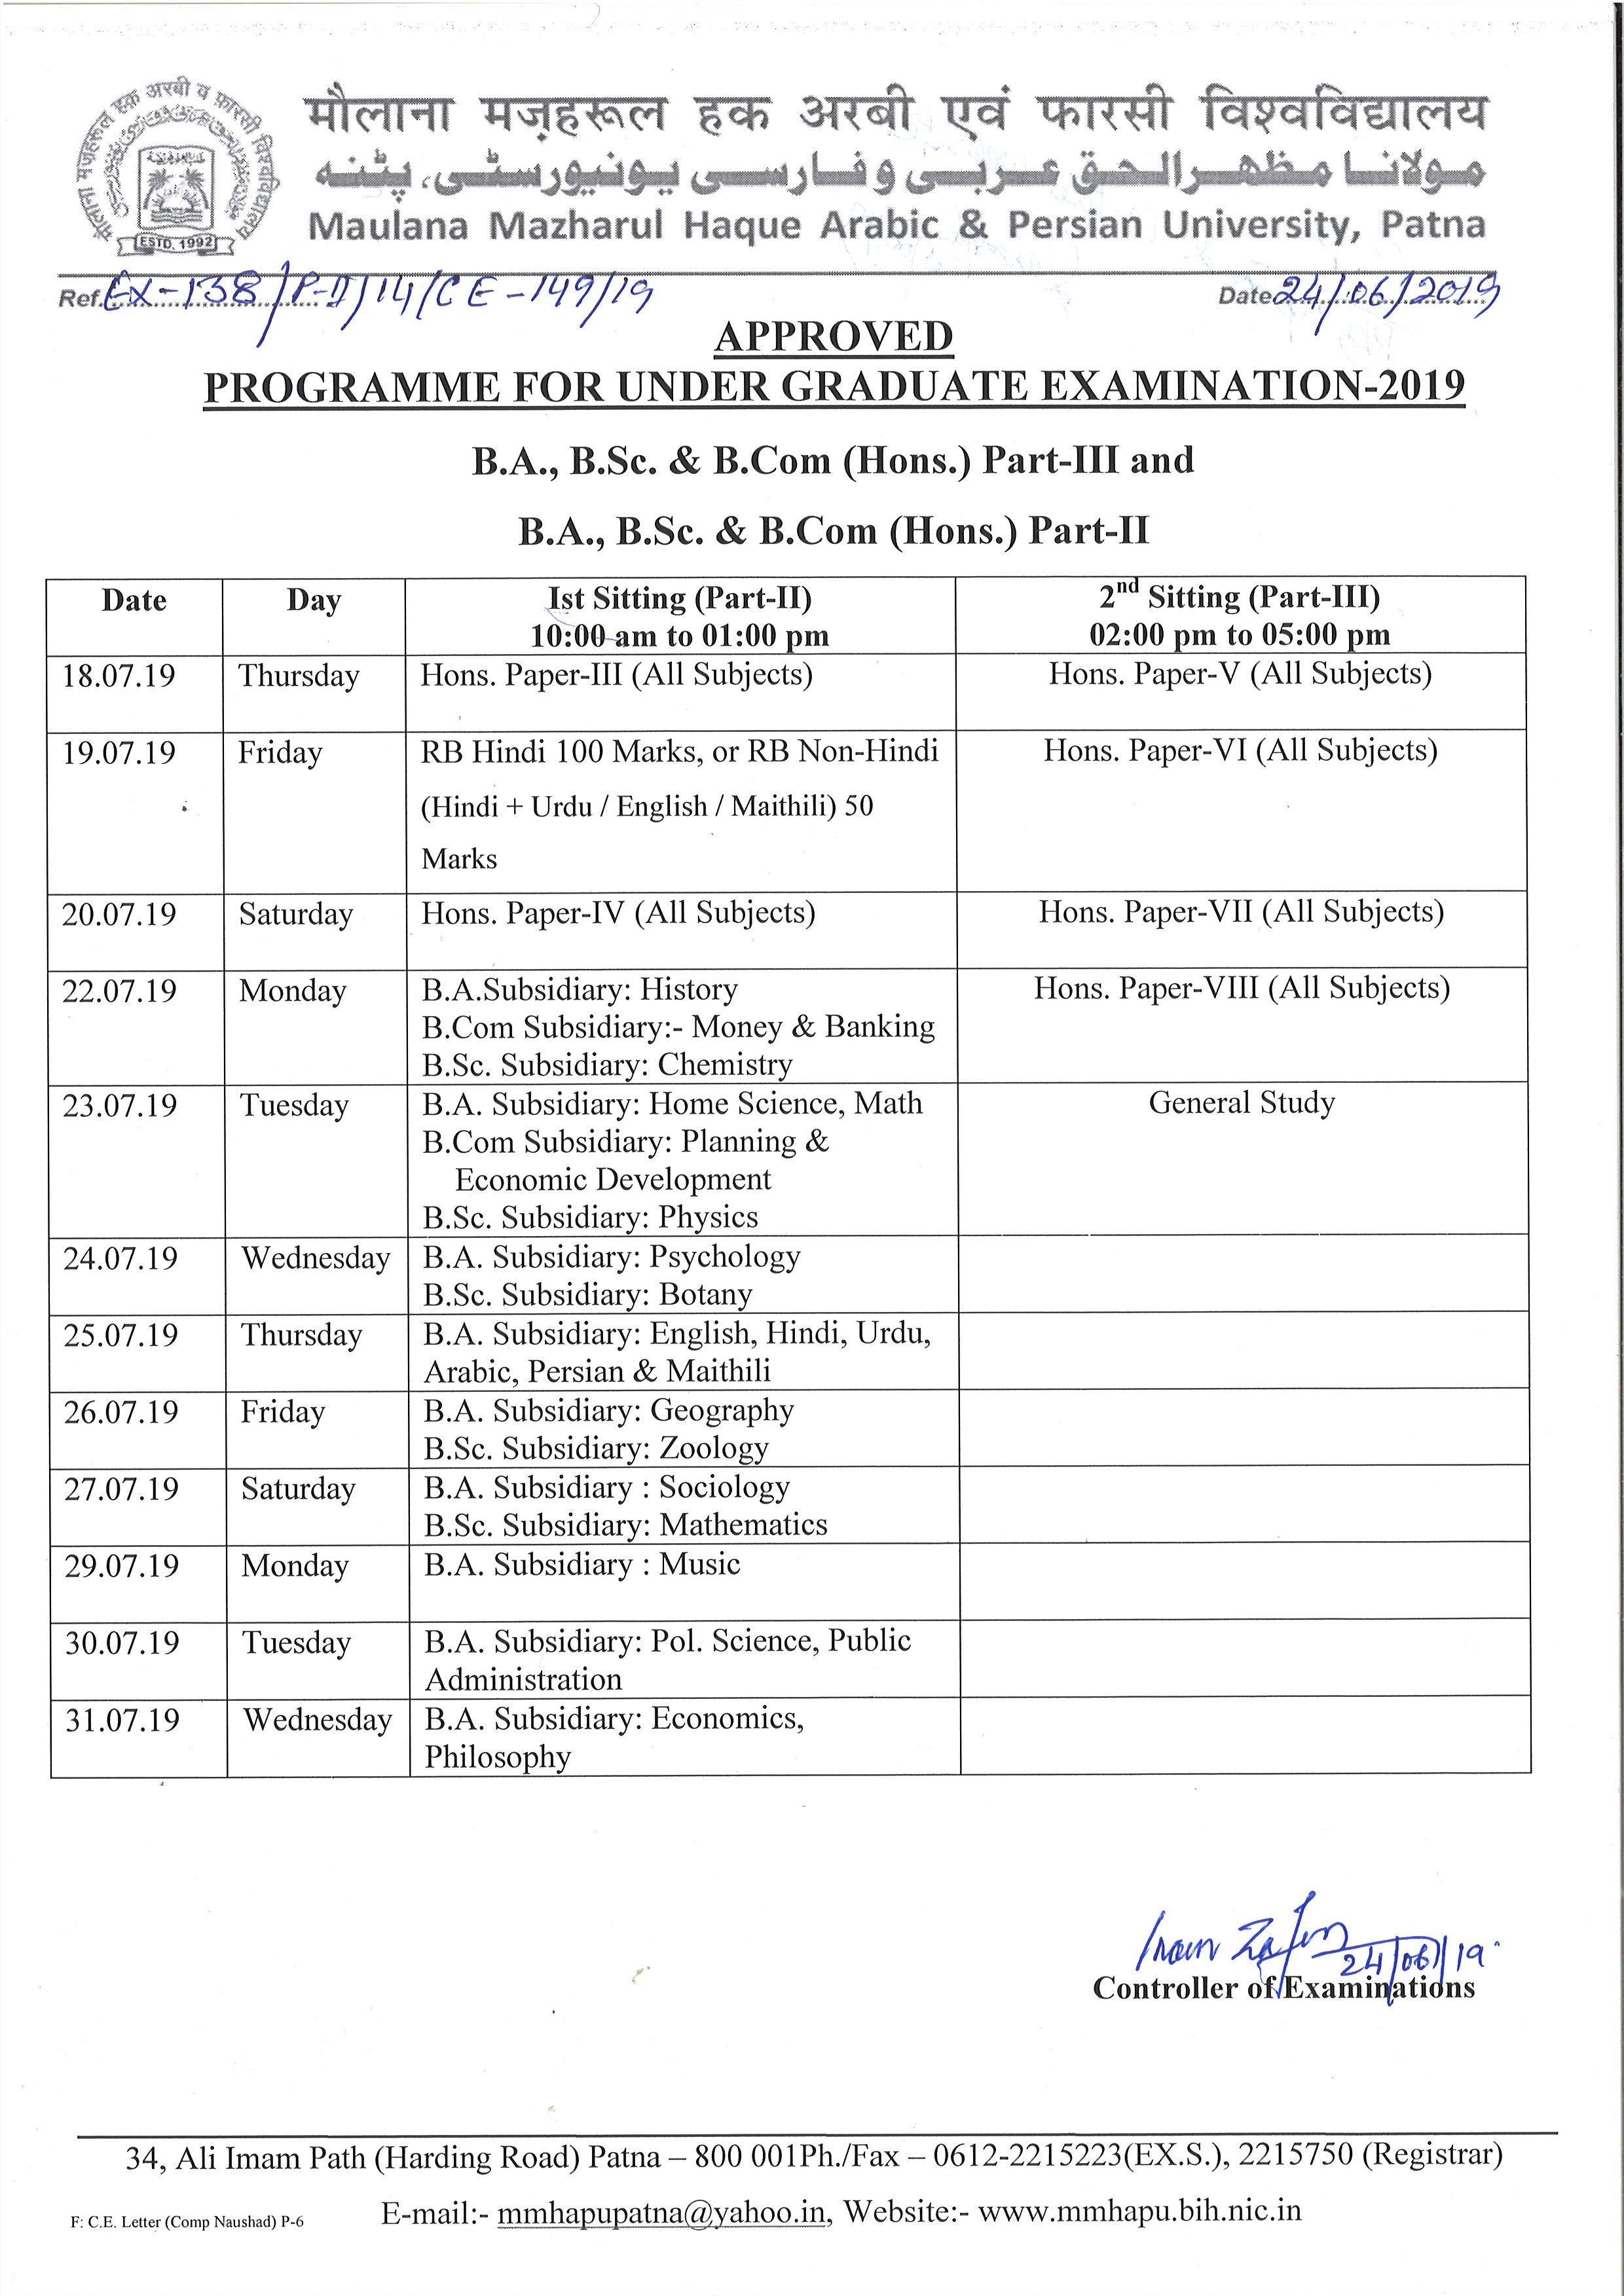 Welcome To The Official Website Of Maulana Mazharul Haque regarding Bihar Calendar 2017